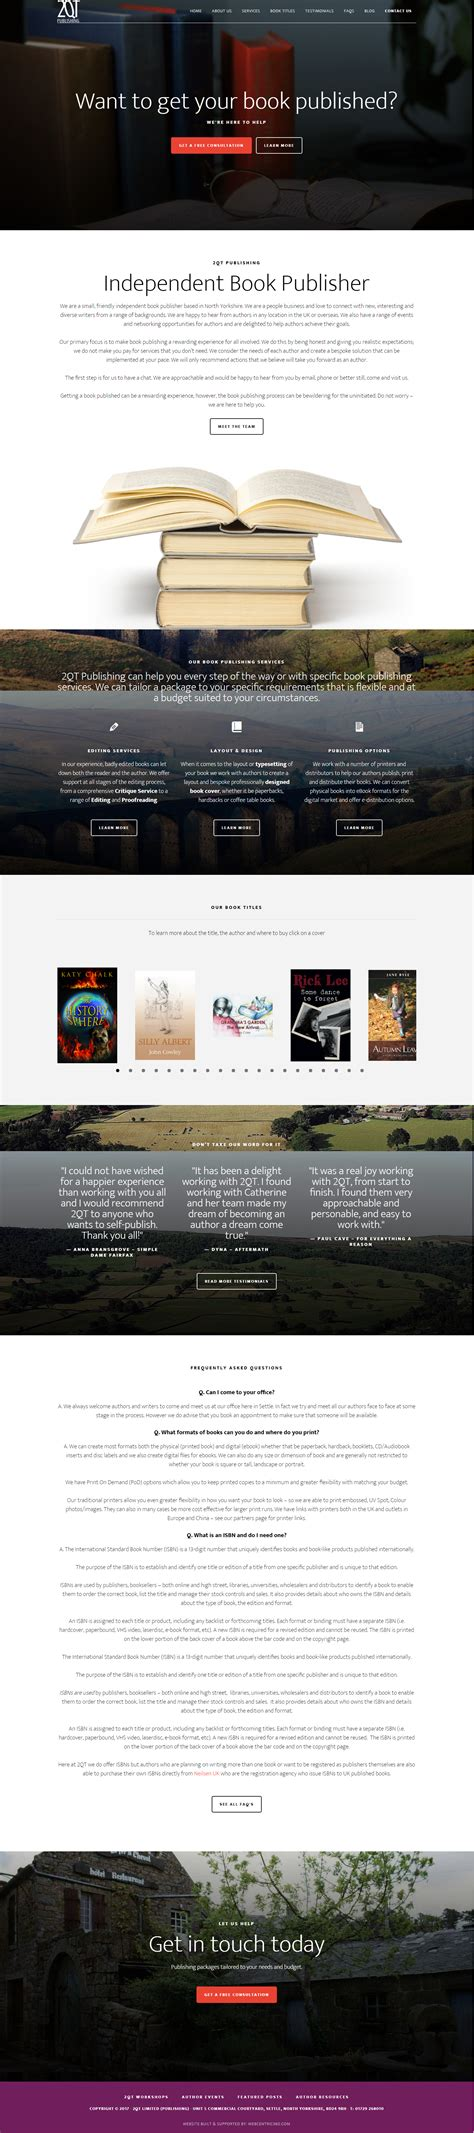 qt layout responsive 2qt publishing web design manchester responsive